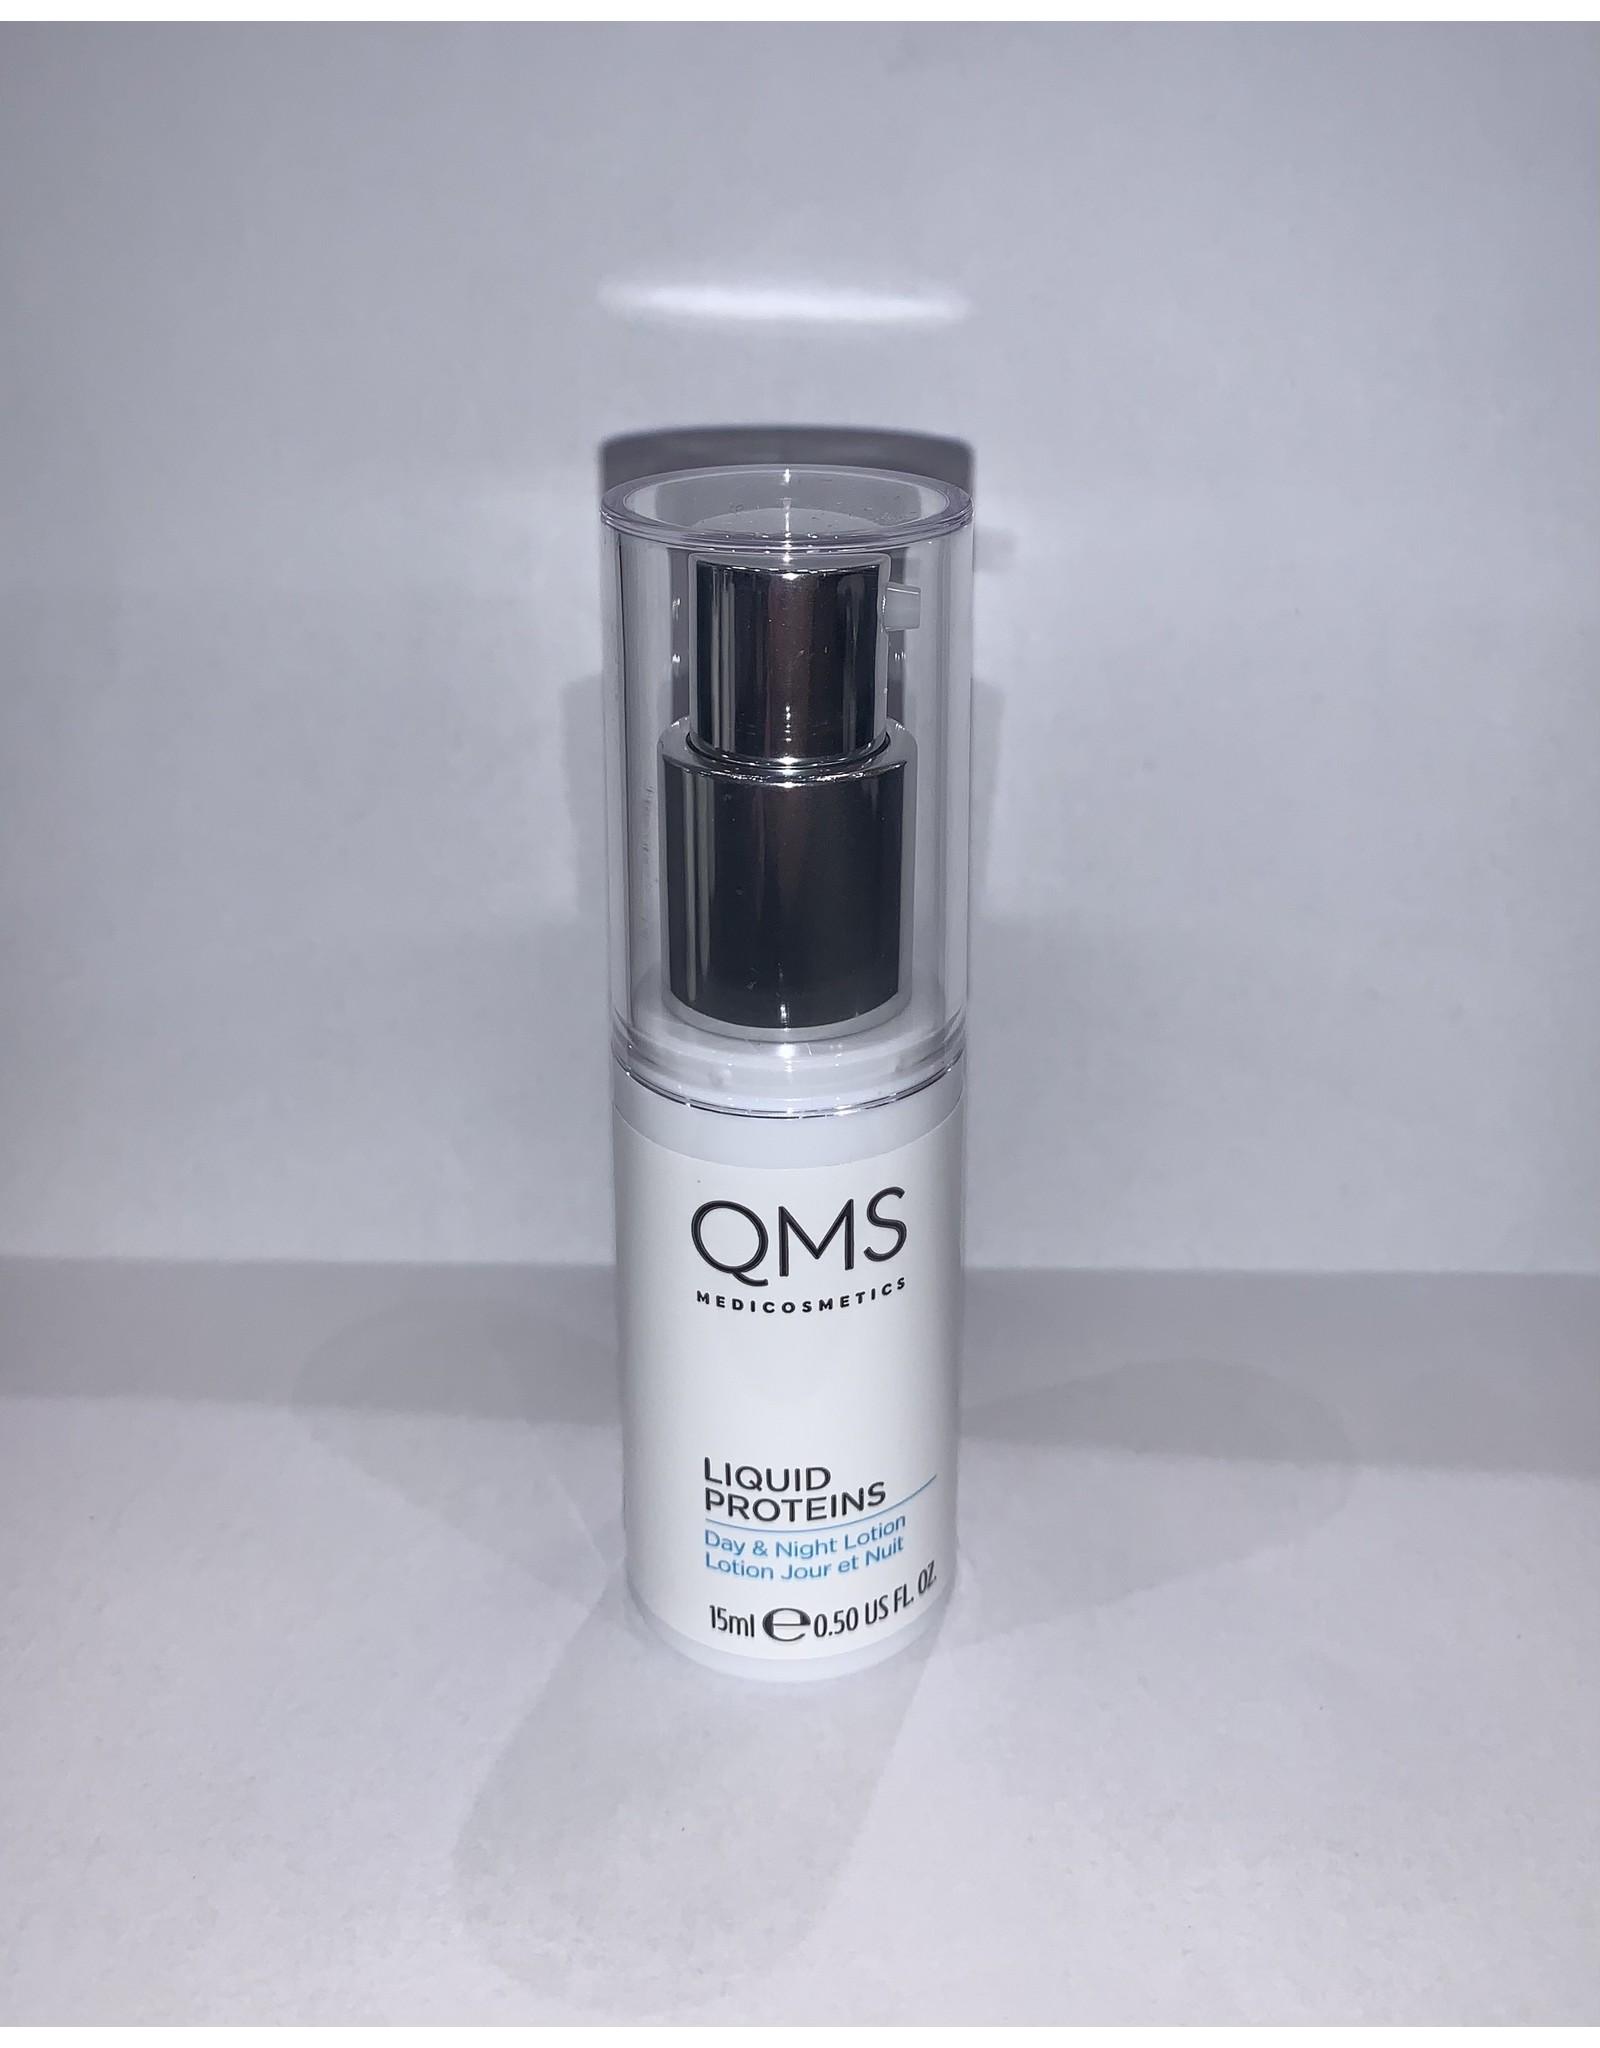 QMS Medicosmetics Travelsize Liquid Proteins, 15ml